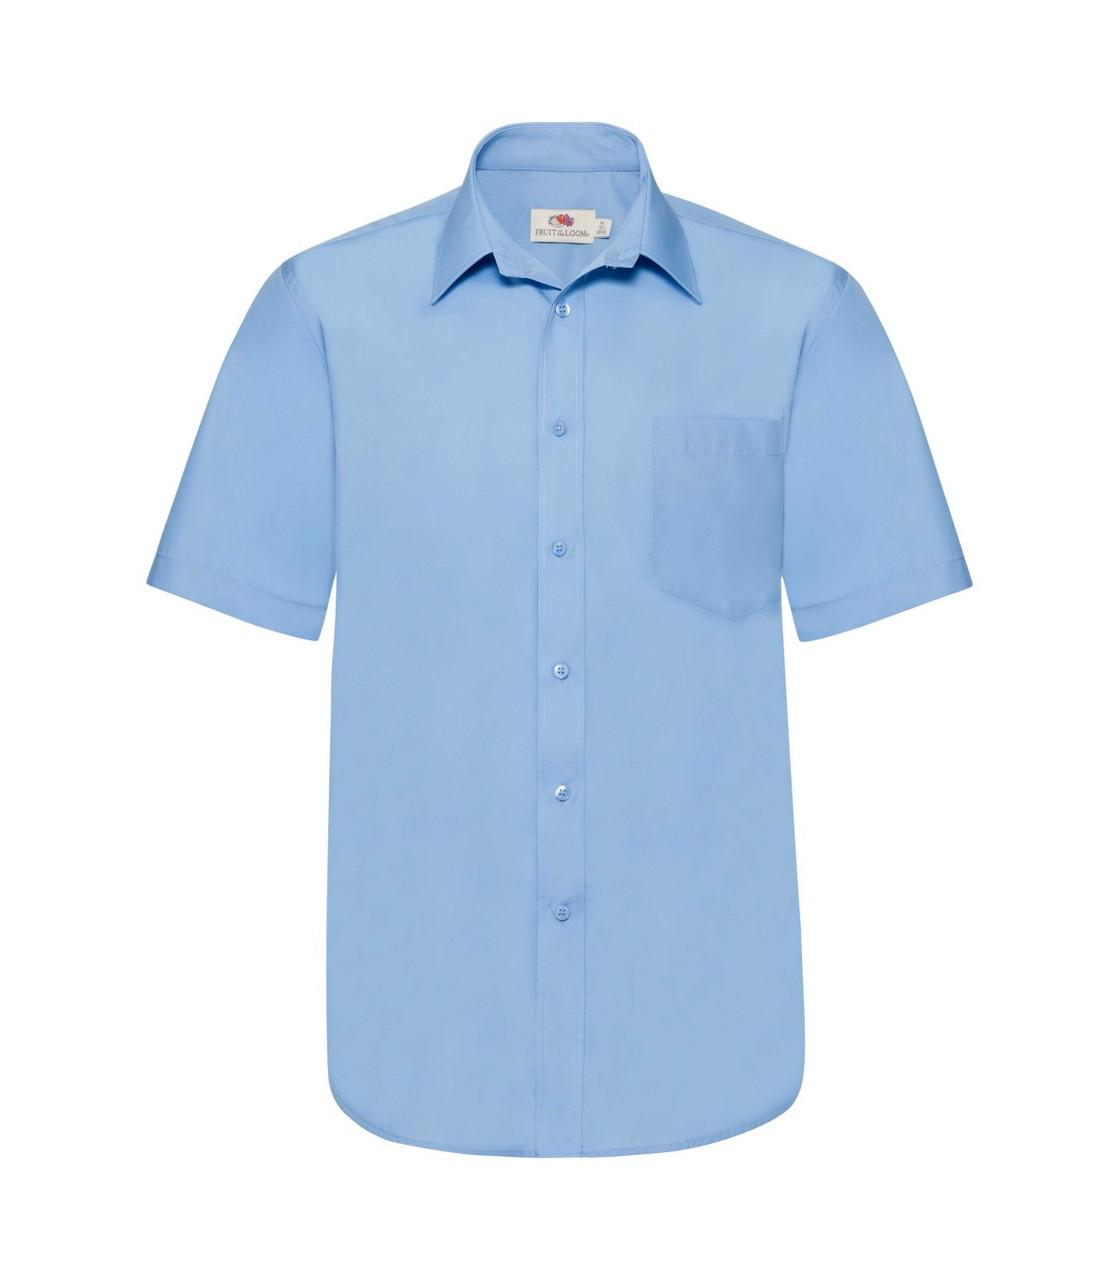 Мужская рубашка с коротким рукавом Poplin голубая 116-УТ